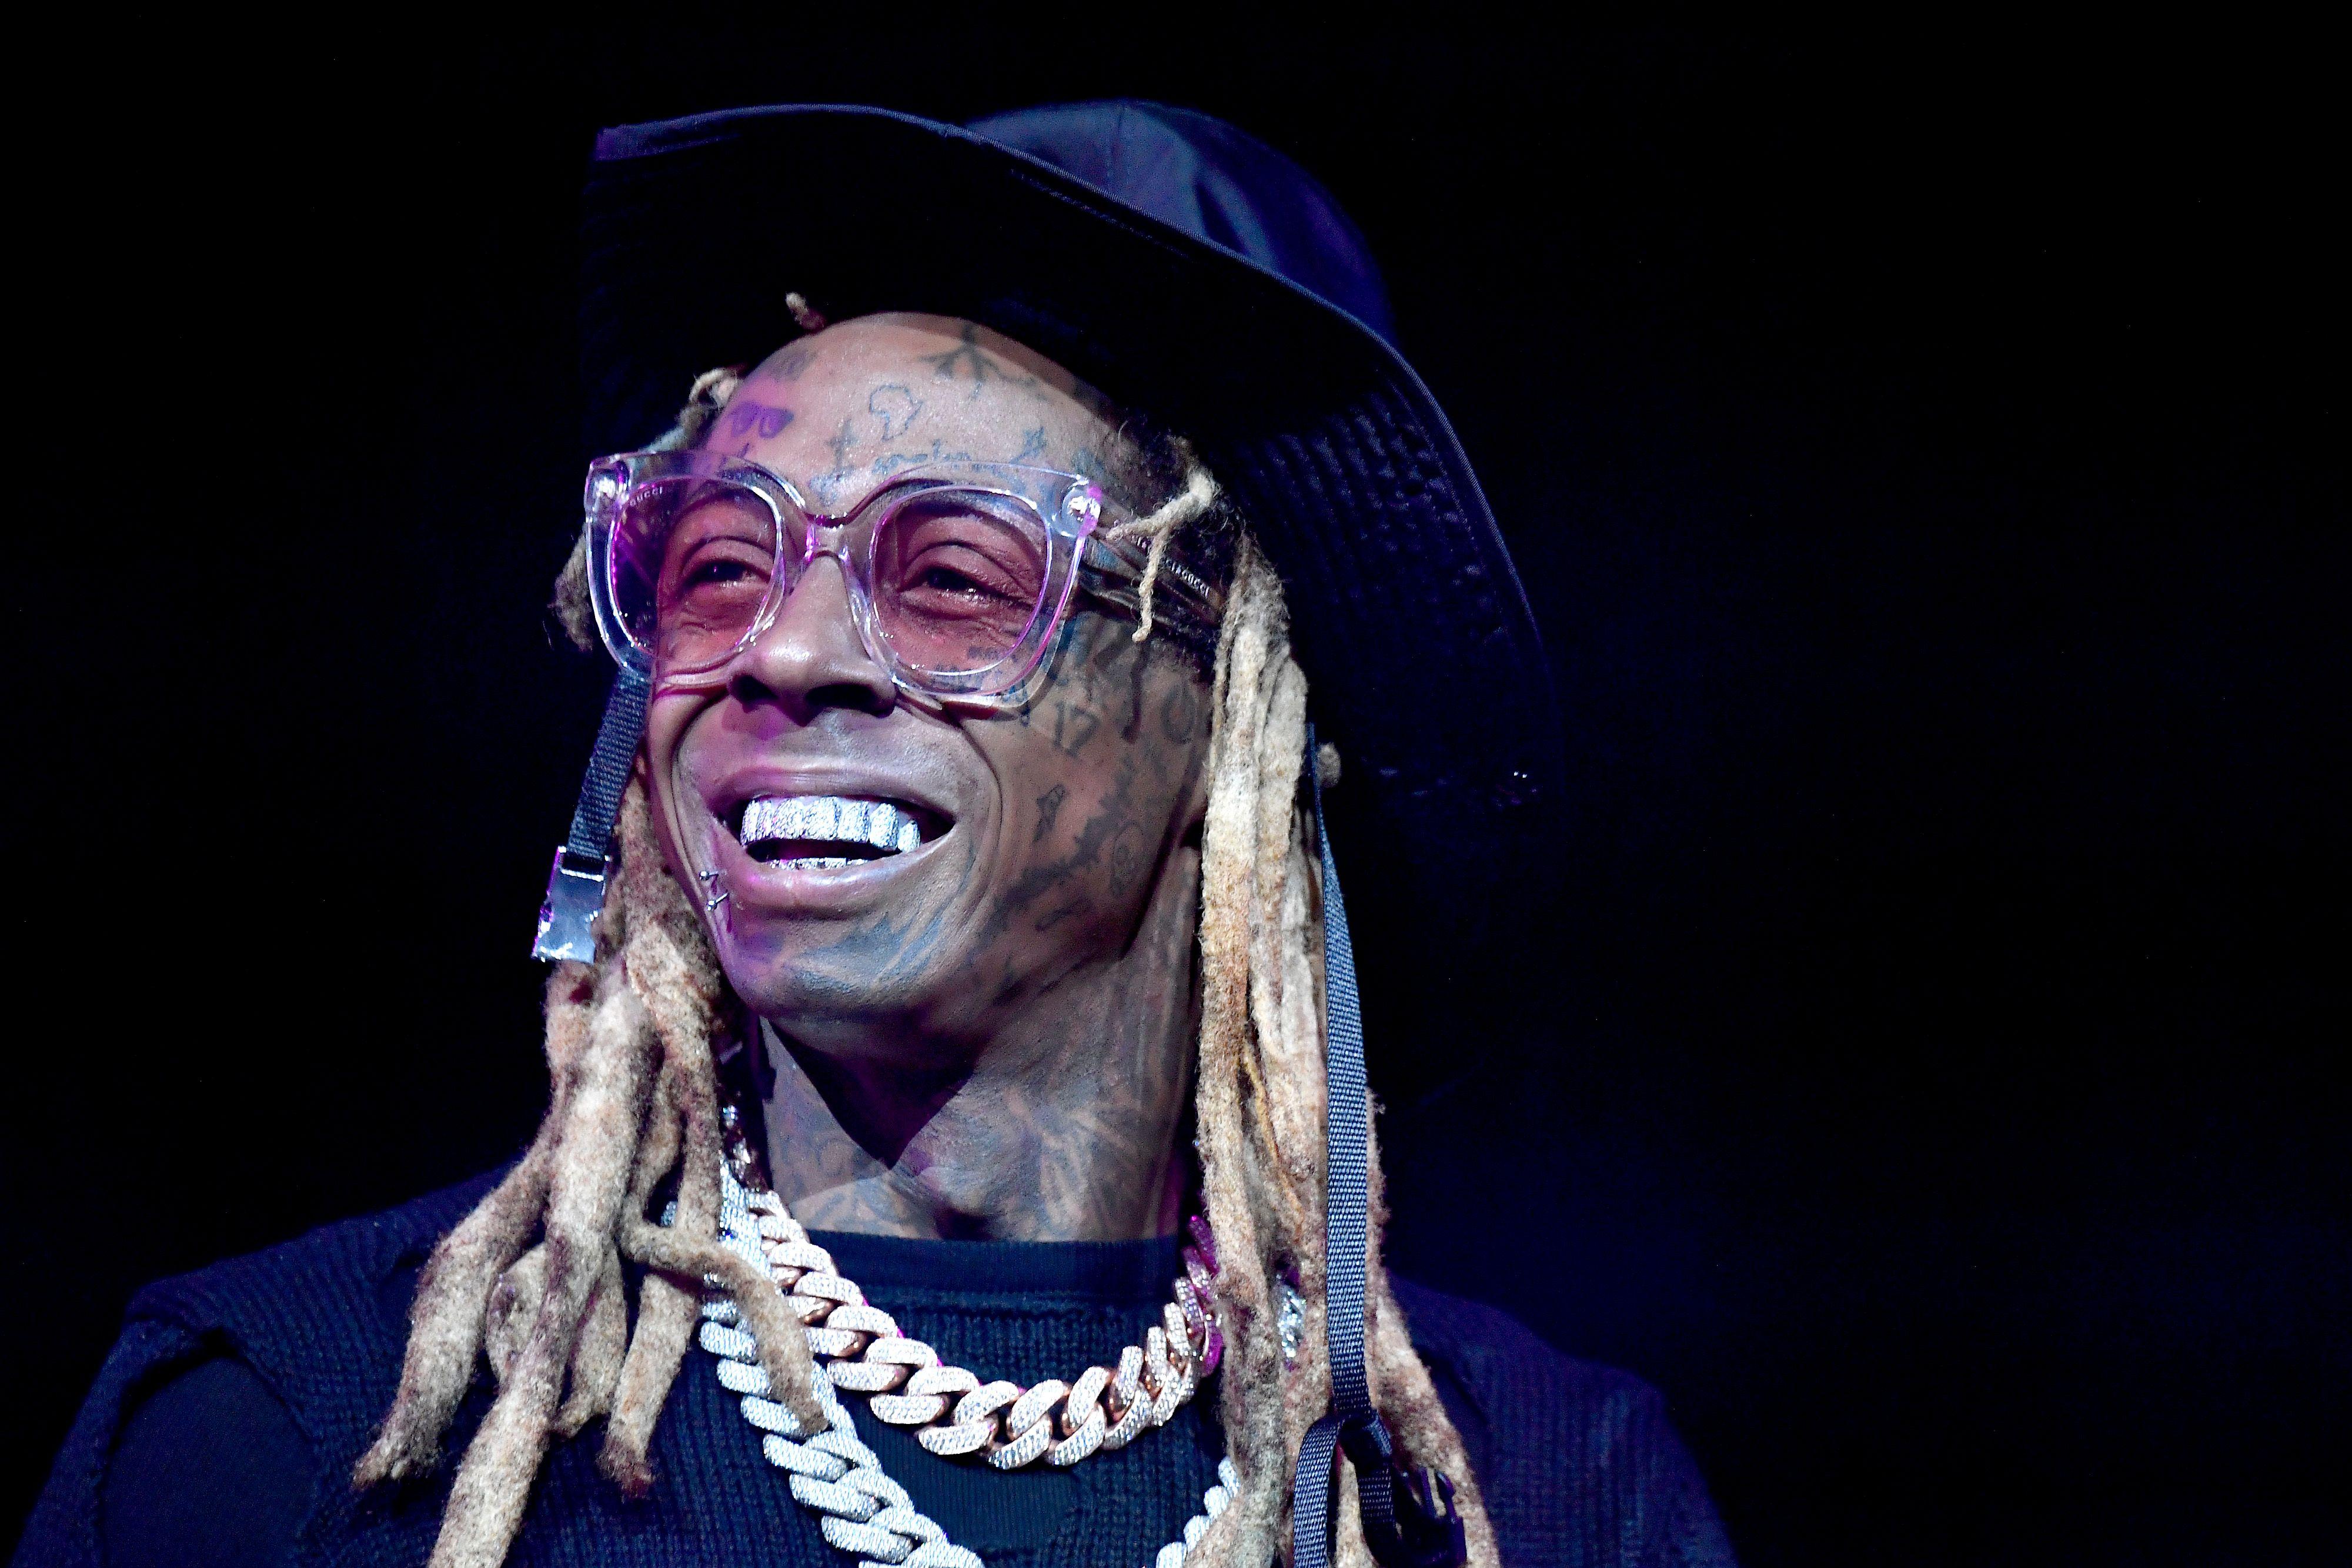 Lil Wayne smiling on stage.